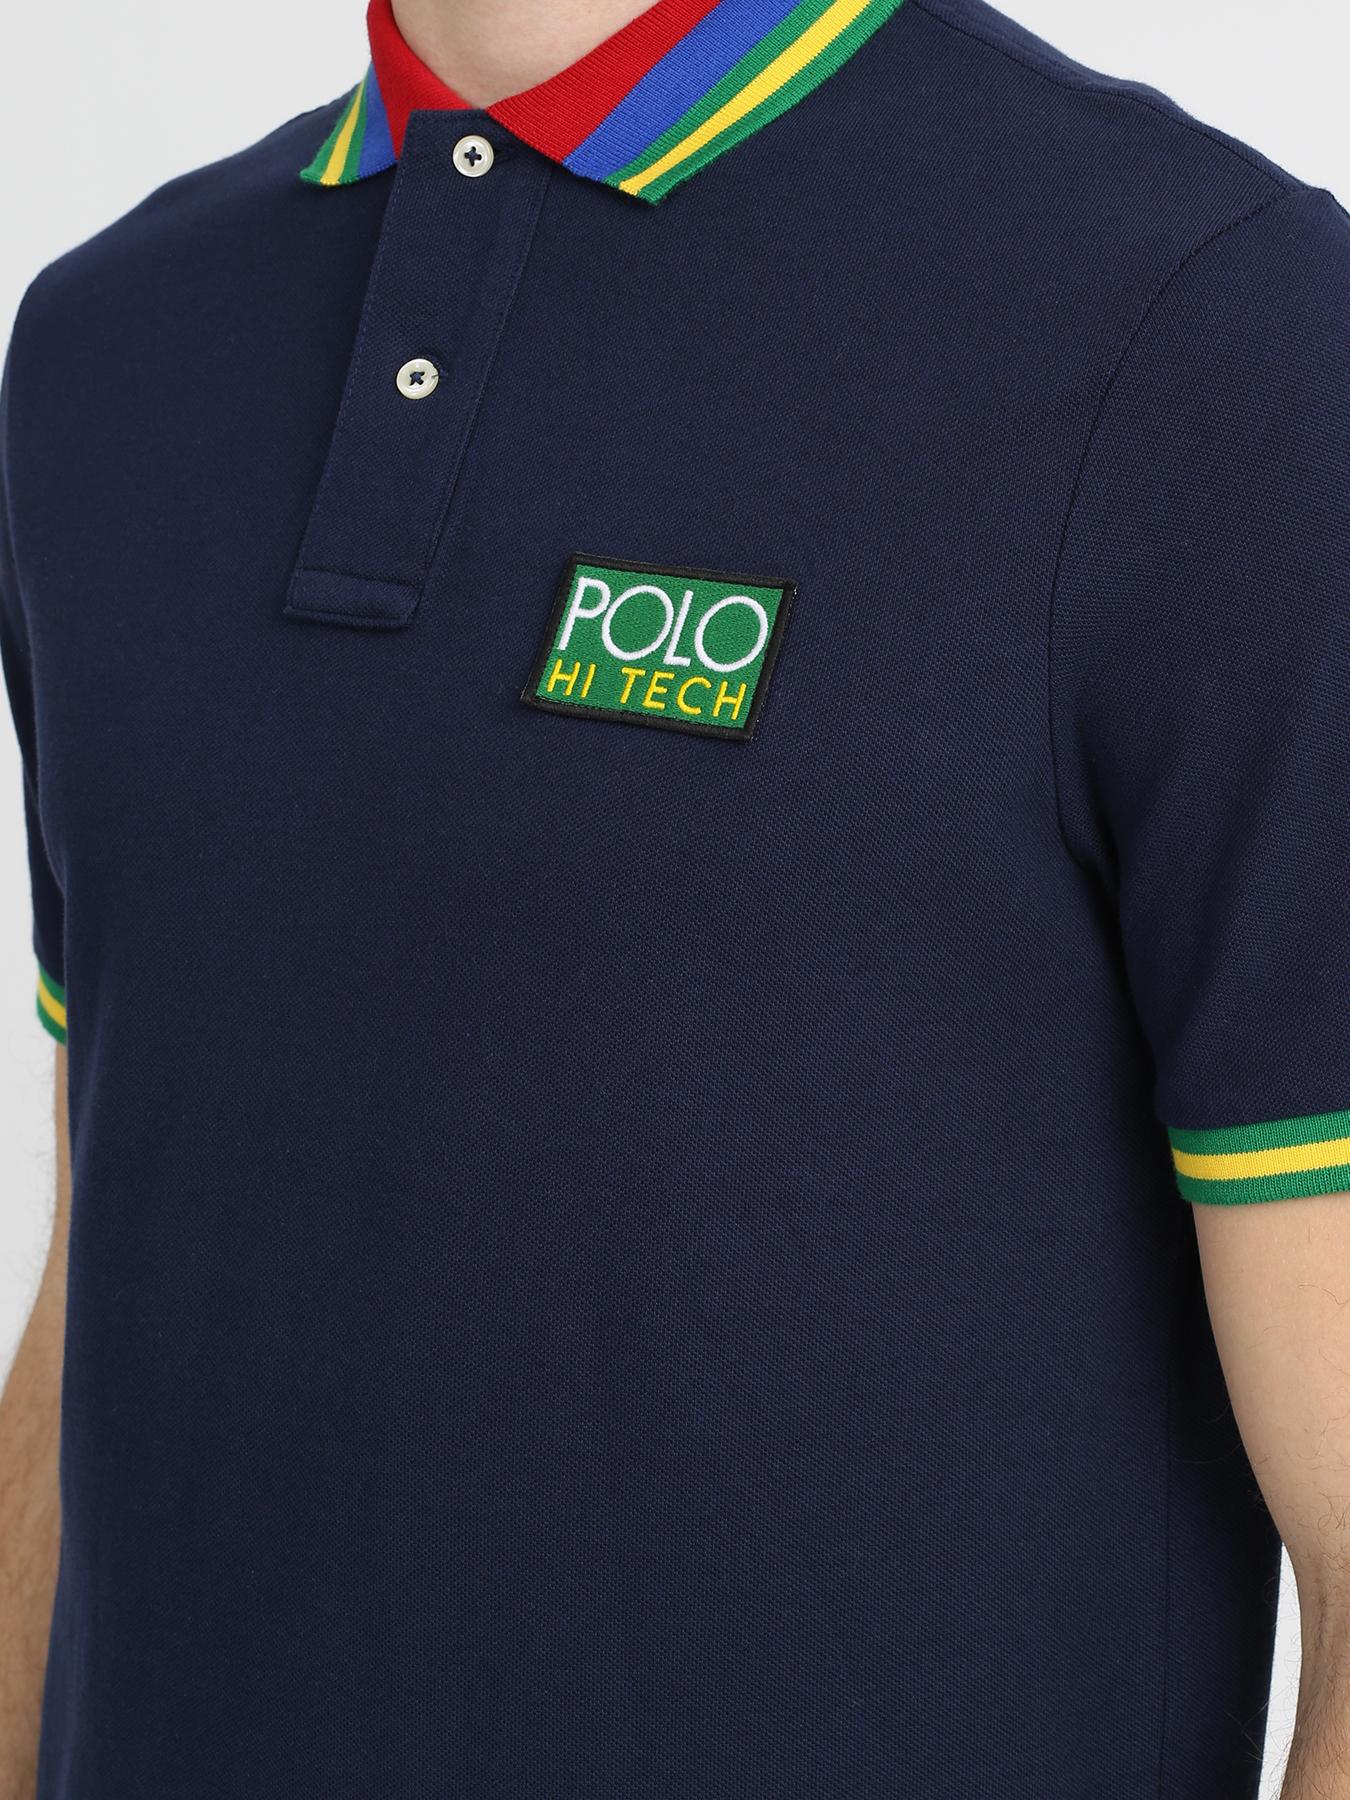 Polo Ralph Lauren Поло с полосками на воротнике 329212-046 Фото 3